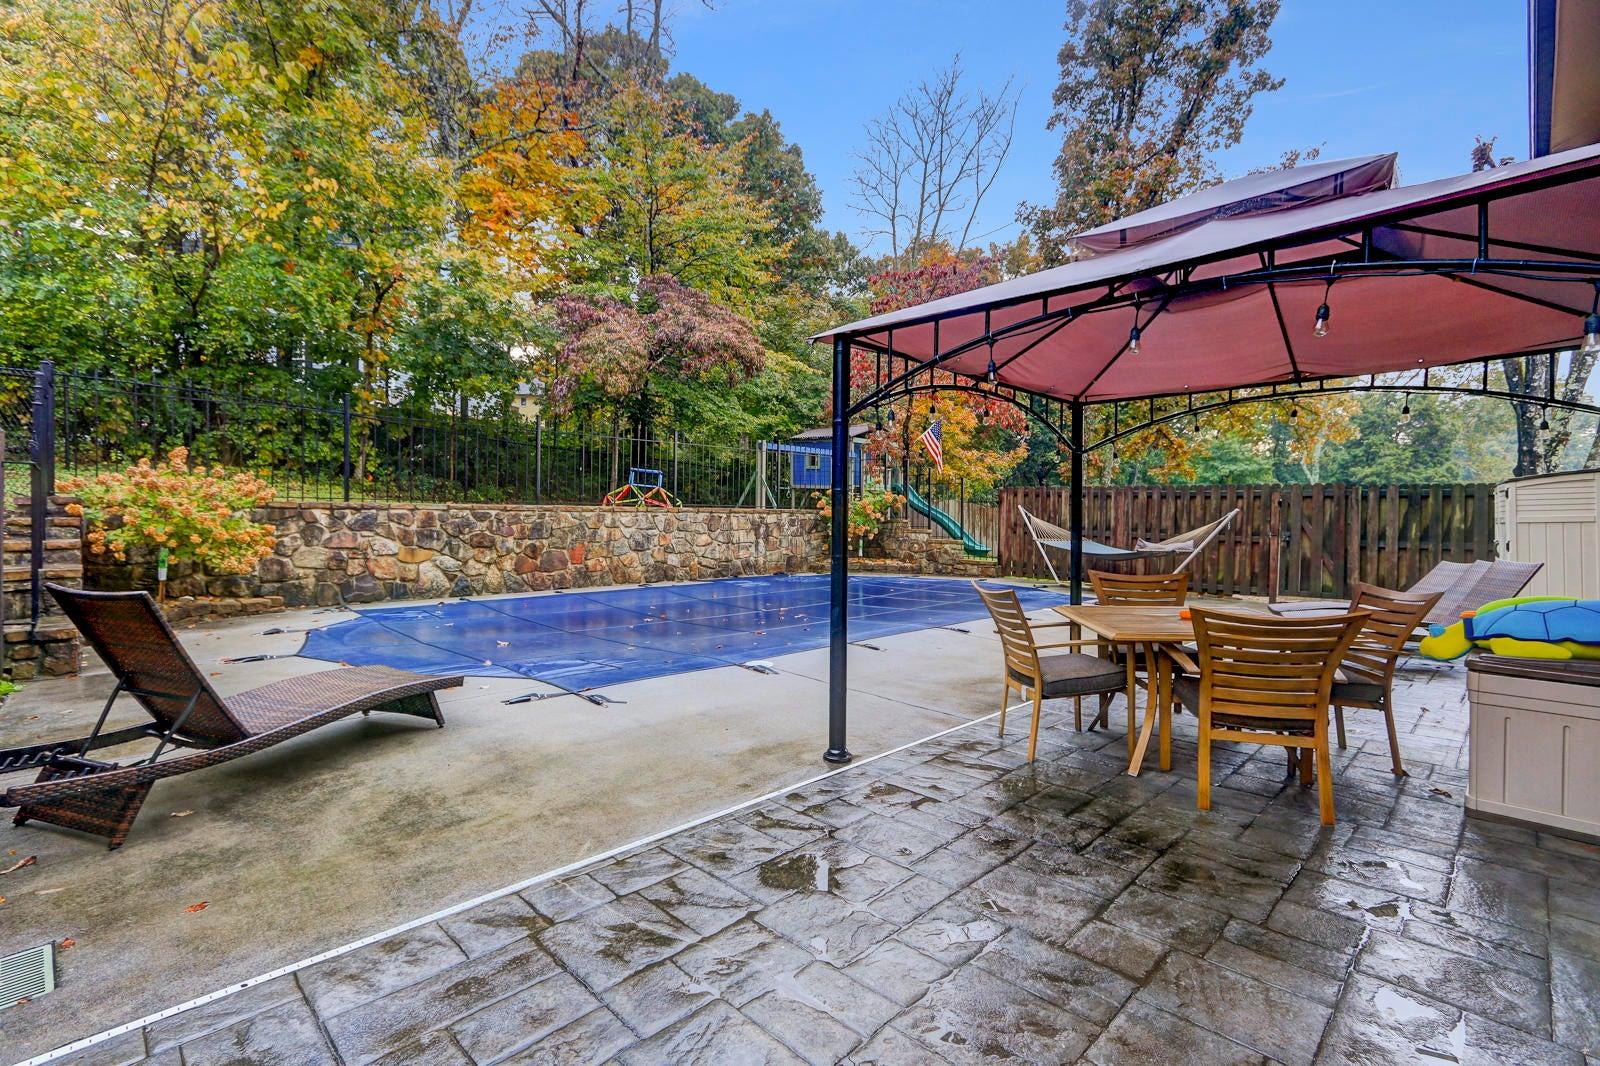 Patio/Pool Area